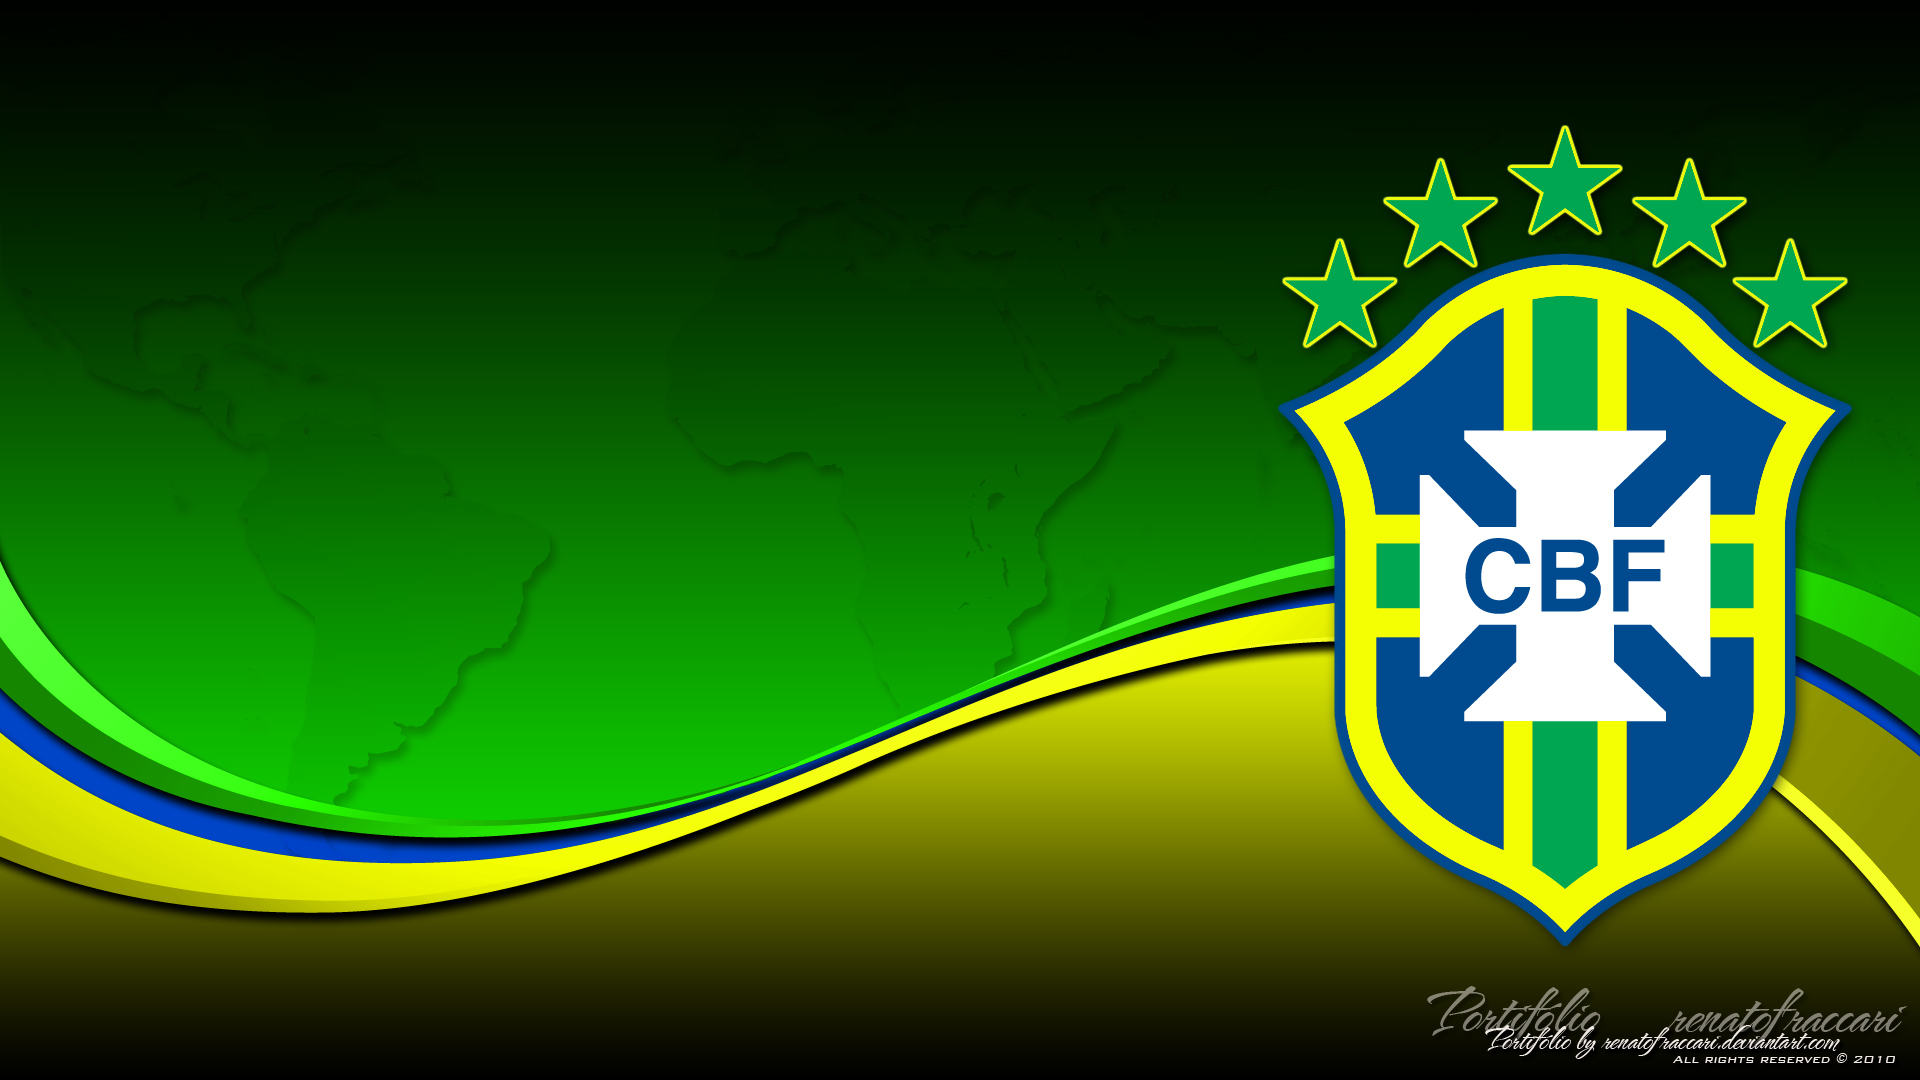 football national teams brazil wallpapers 1652 16 wallpaper id 2199 1920x1080